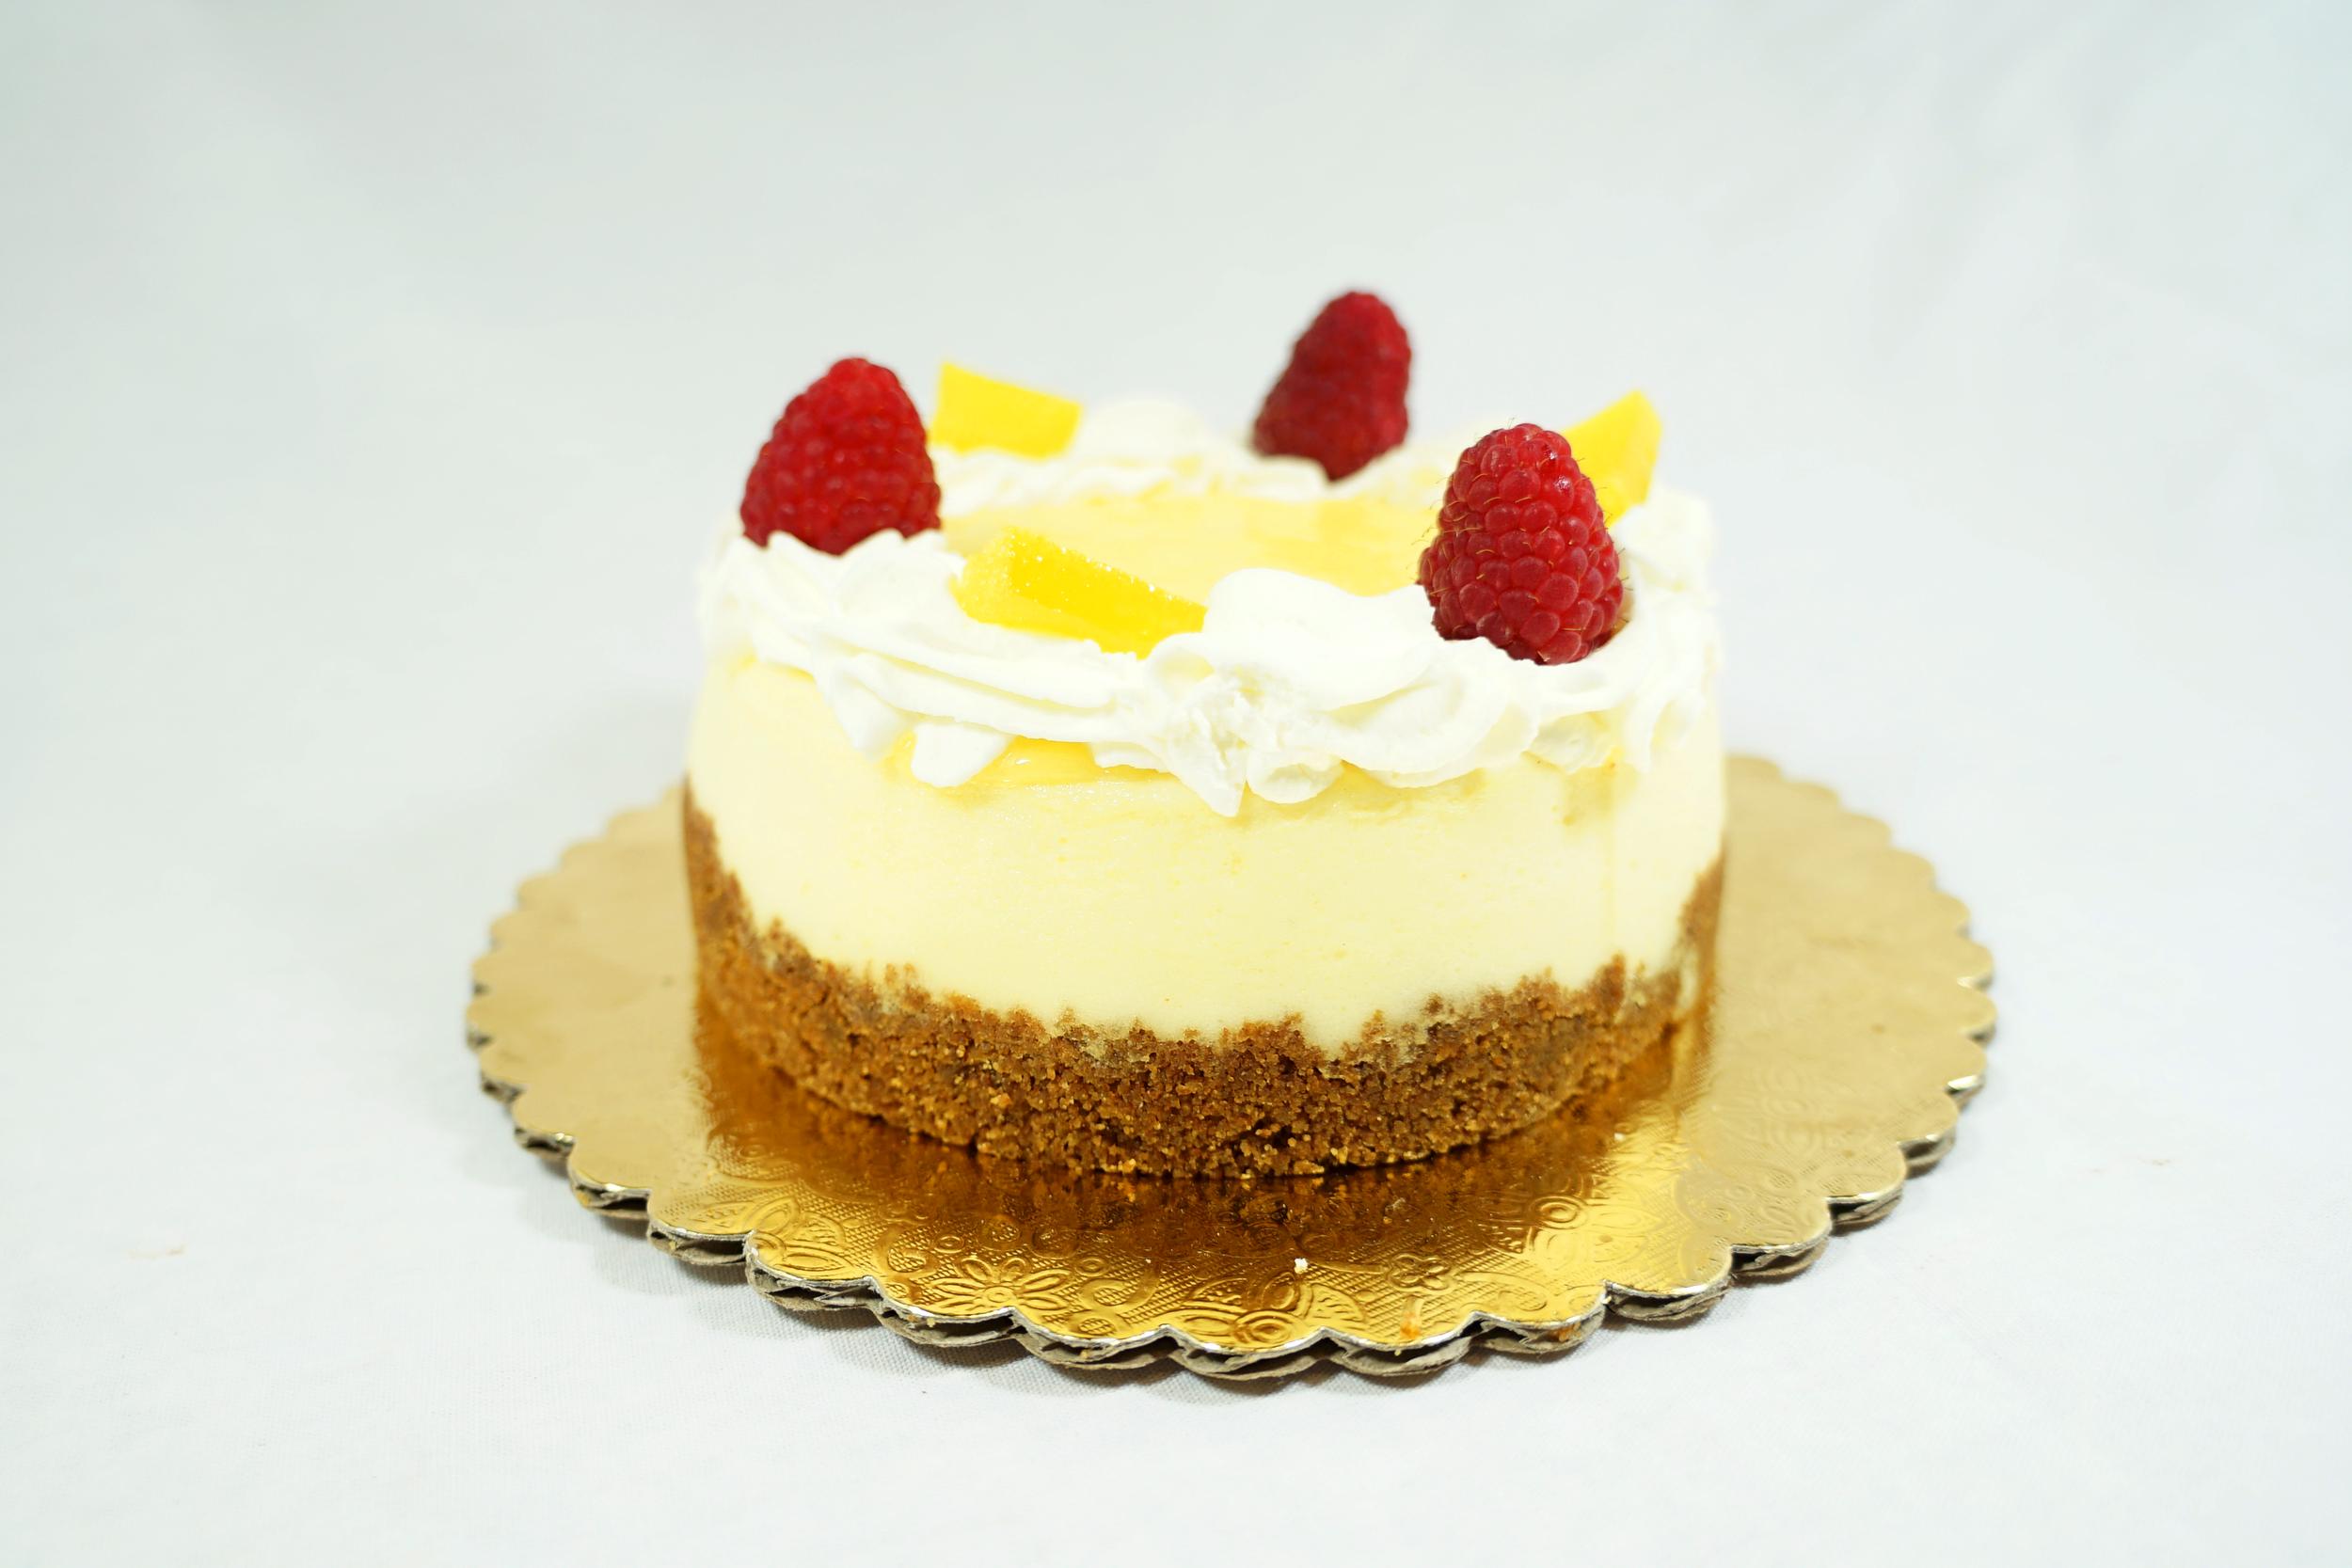 Lemon Cheesecake - Graham cracker crust with lemon curd topping.